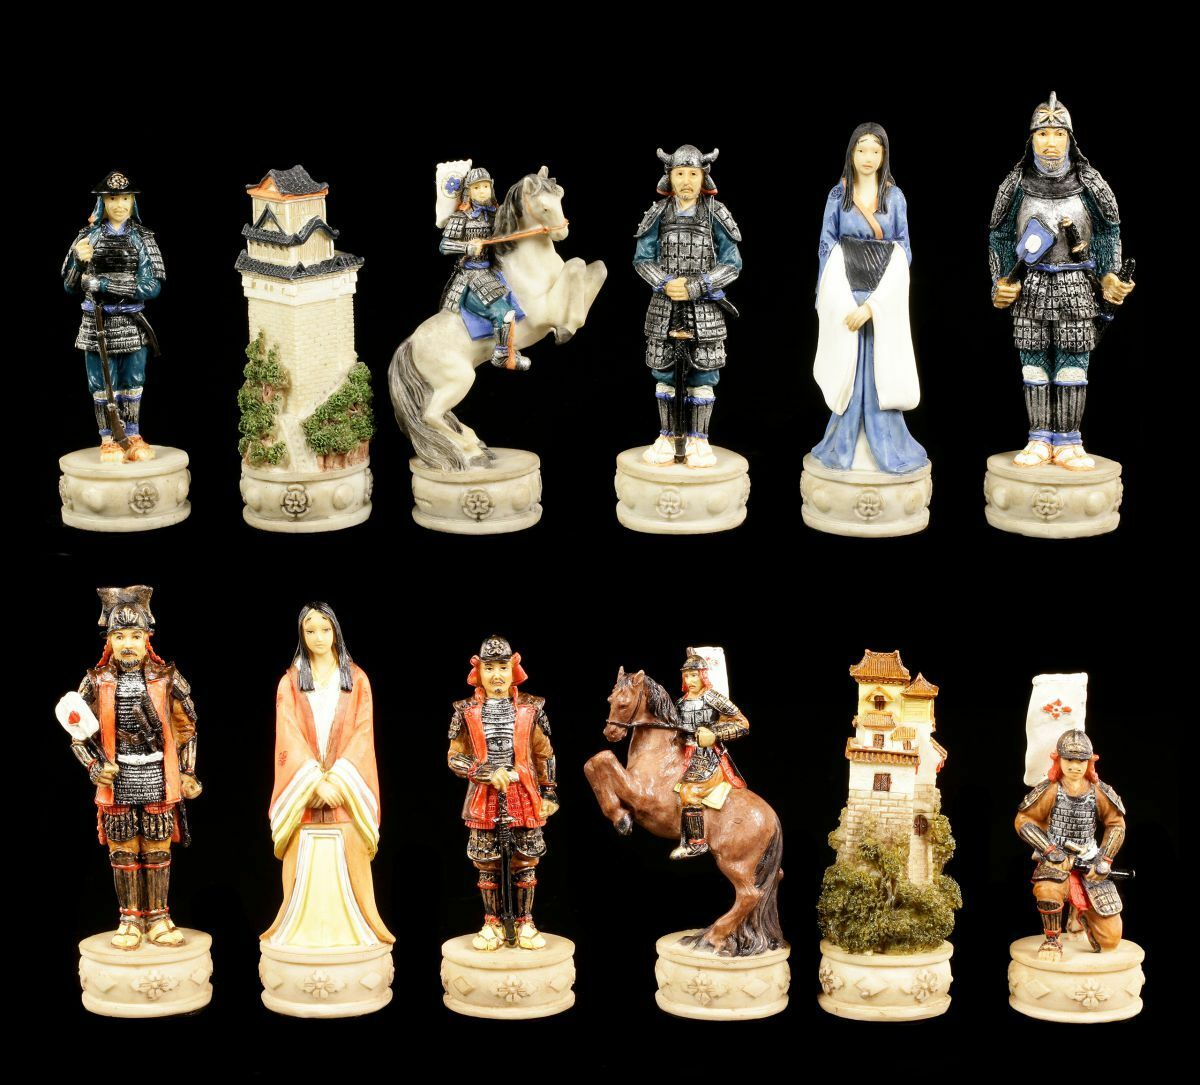 Piezas de Ajedrez - Set de Samurai Guerrero - Ajedrez Figuras Veronese